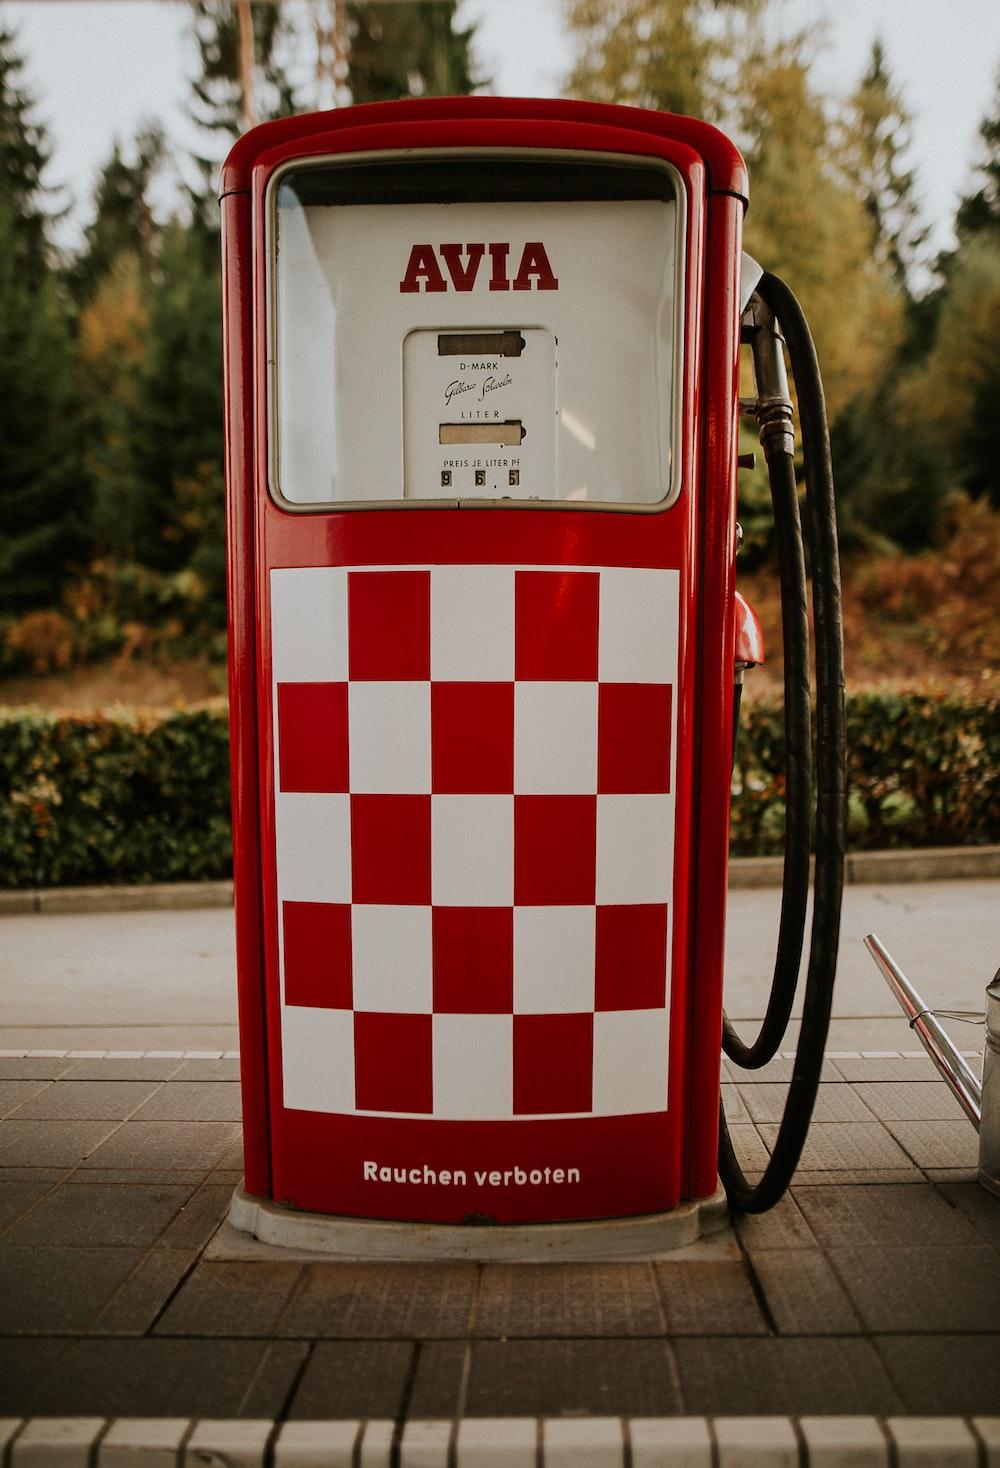 red and white Avia gasoline machine